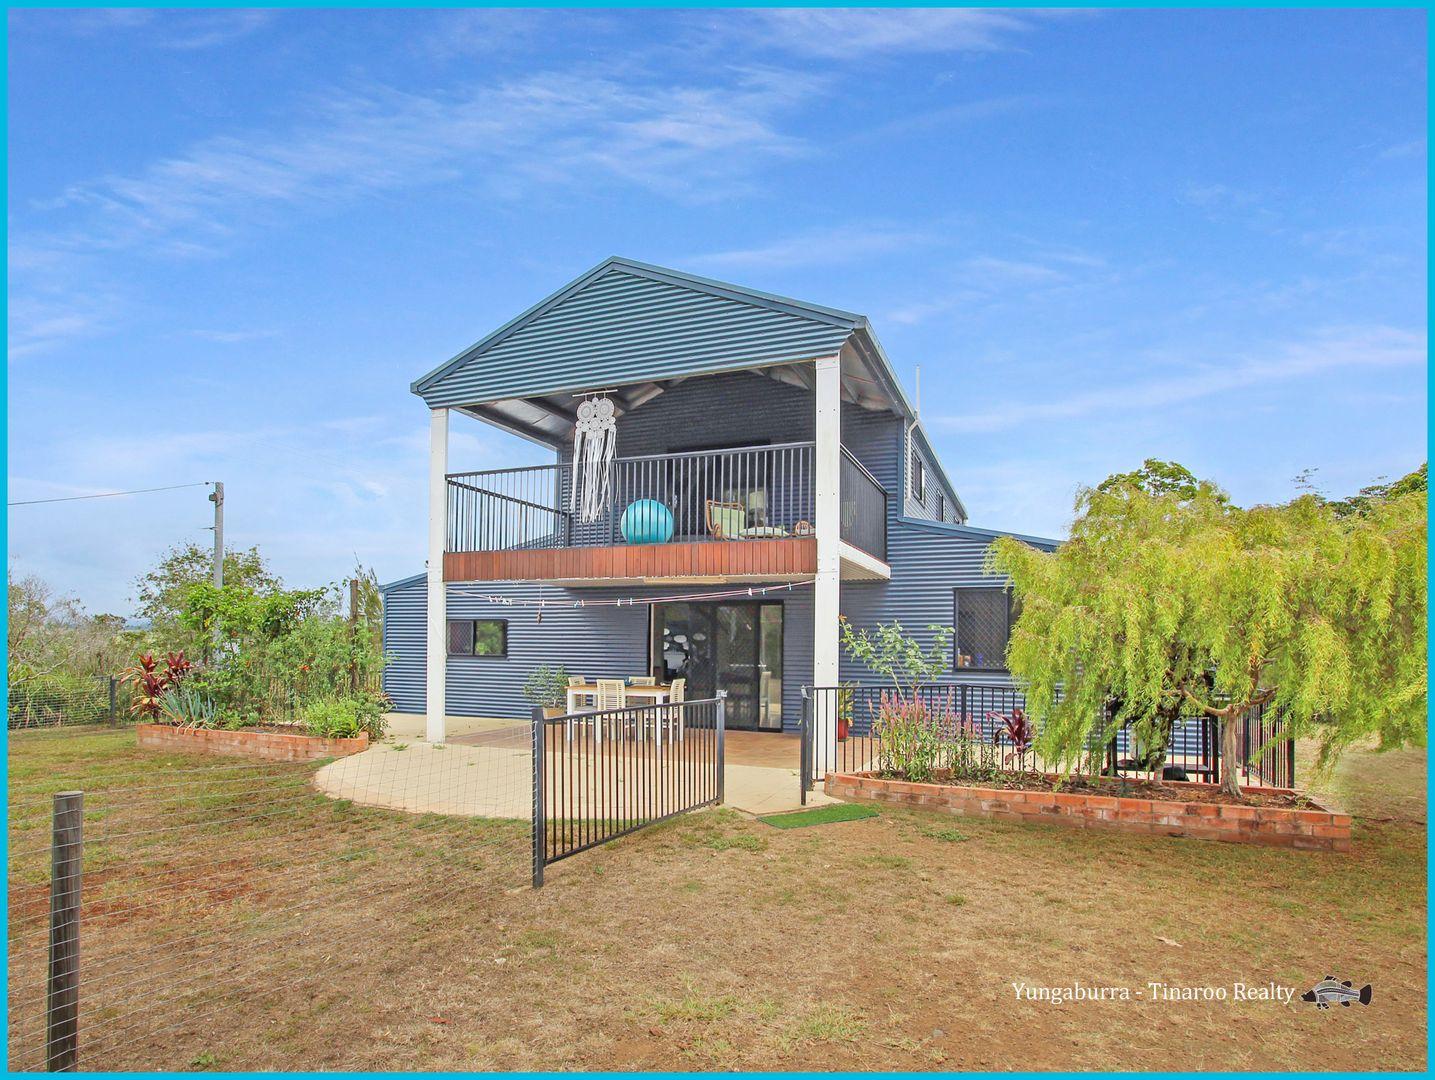 9 Kluck Rd, Yungaburra QLD 4884, Image 0